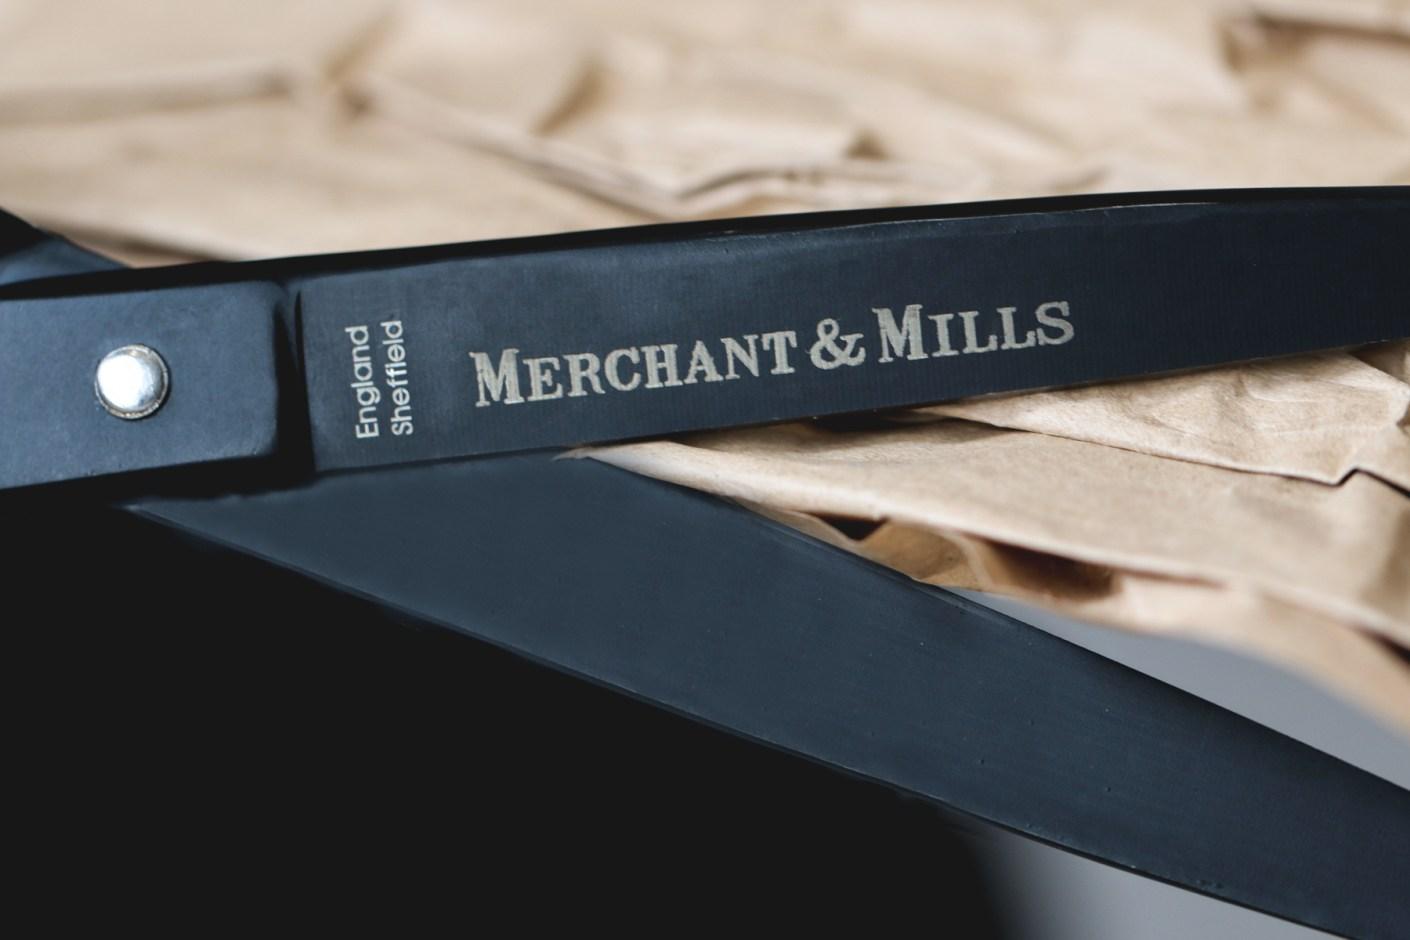 Image of Carhartt WIP x Merchant & Mills Teflon Scissors